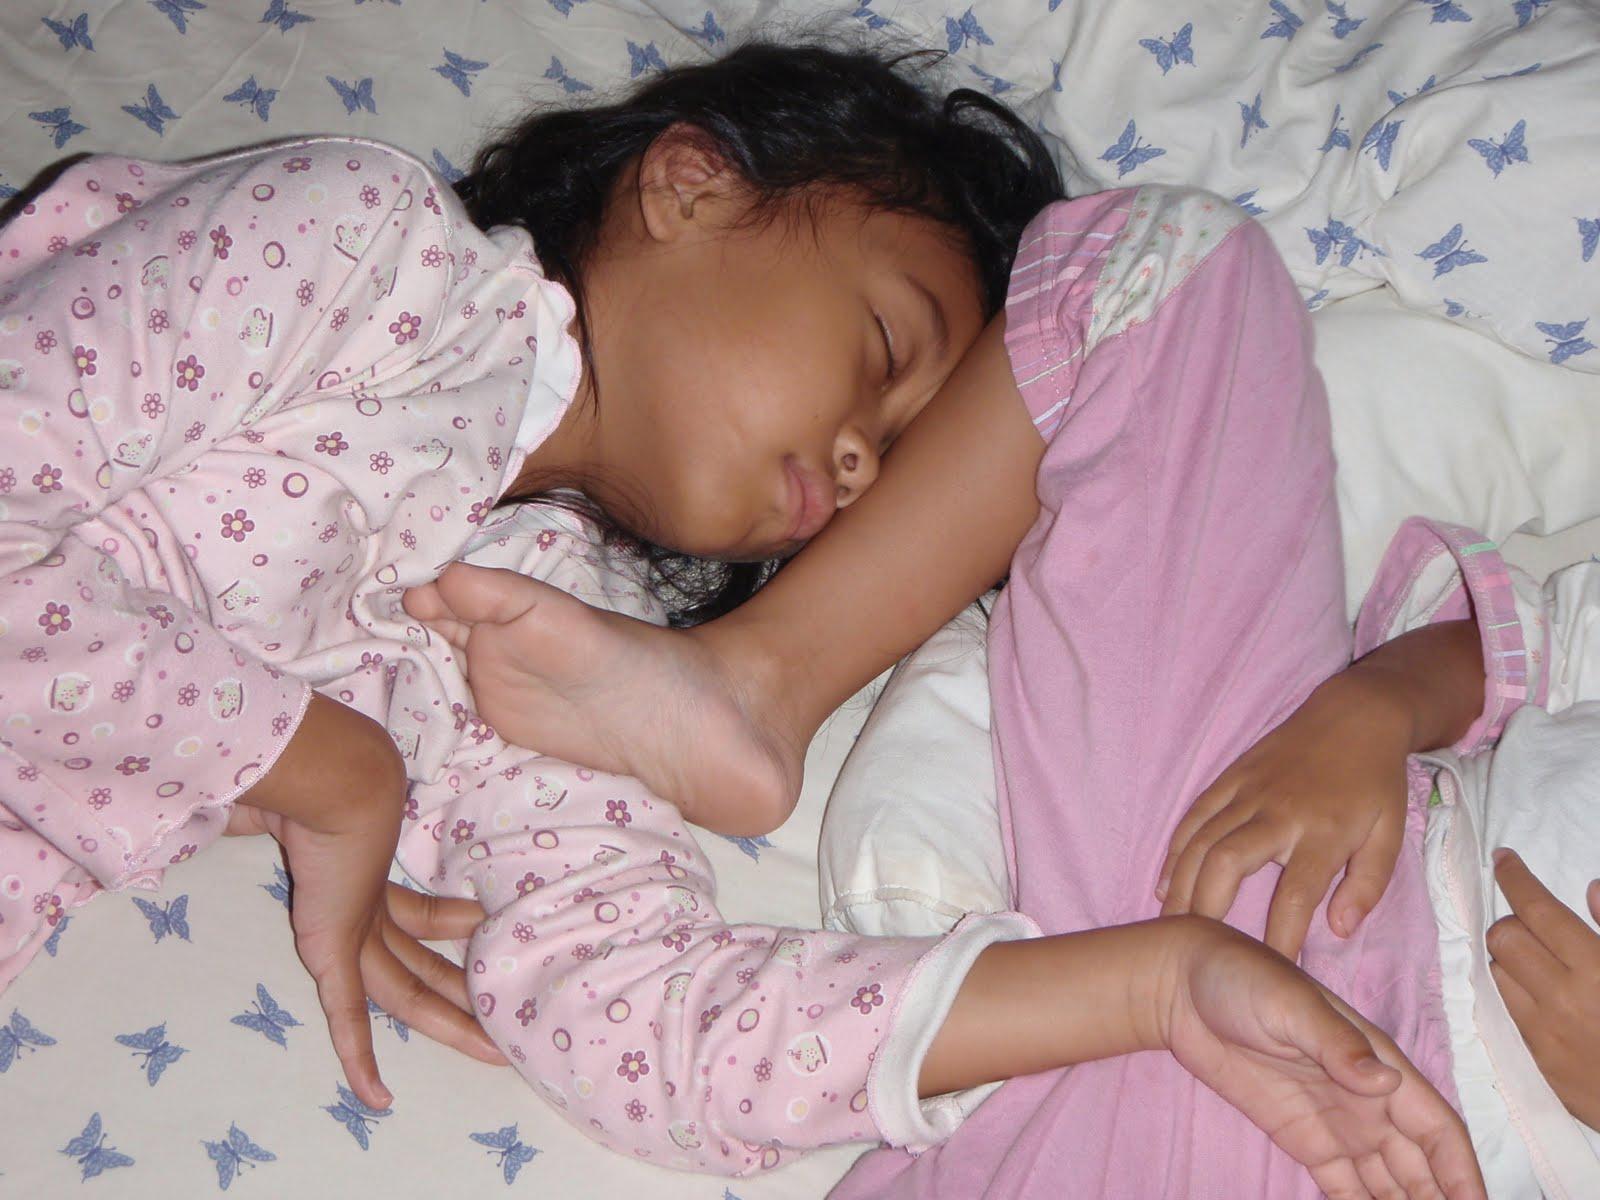 Anak Kecil Mesum | Download Foto, Gambar, Wallpaper | Film ...